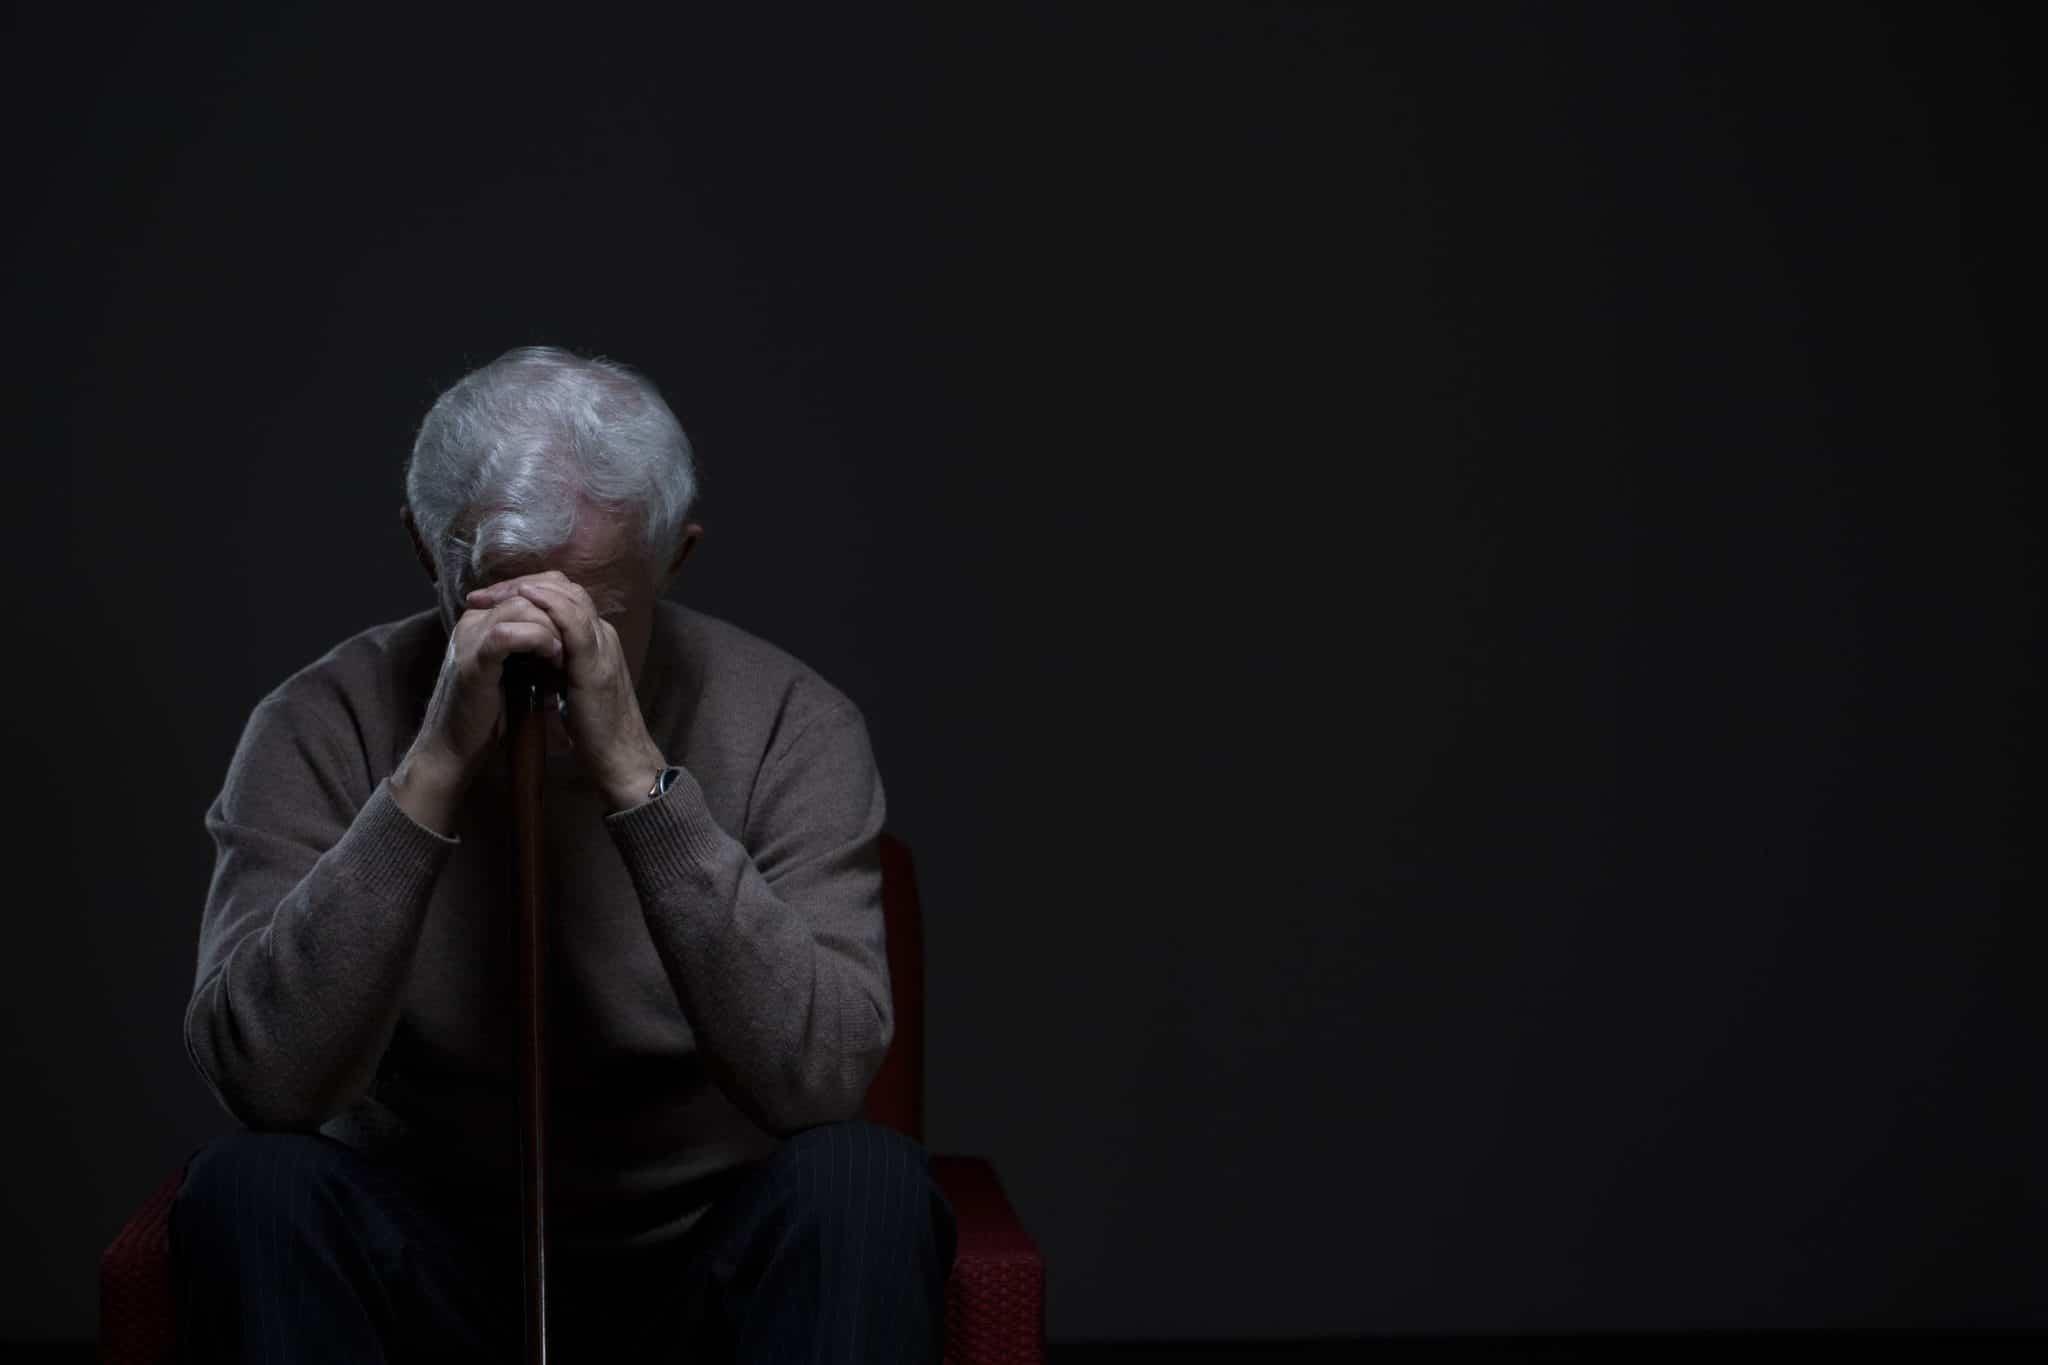 Older Man in Dark with Head in His Hands